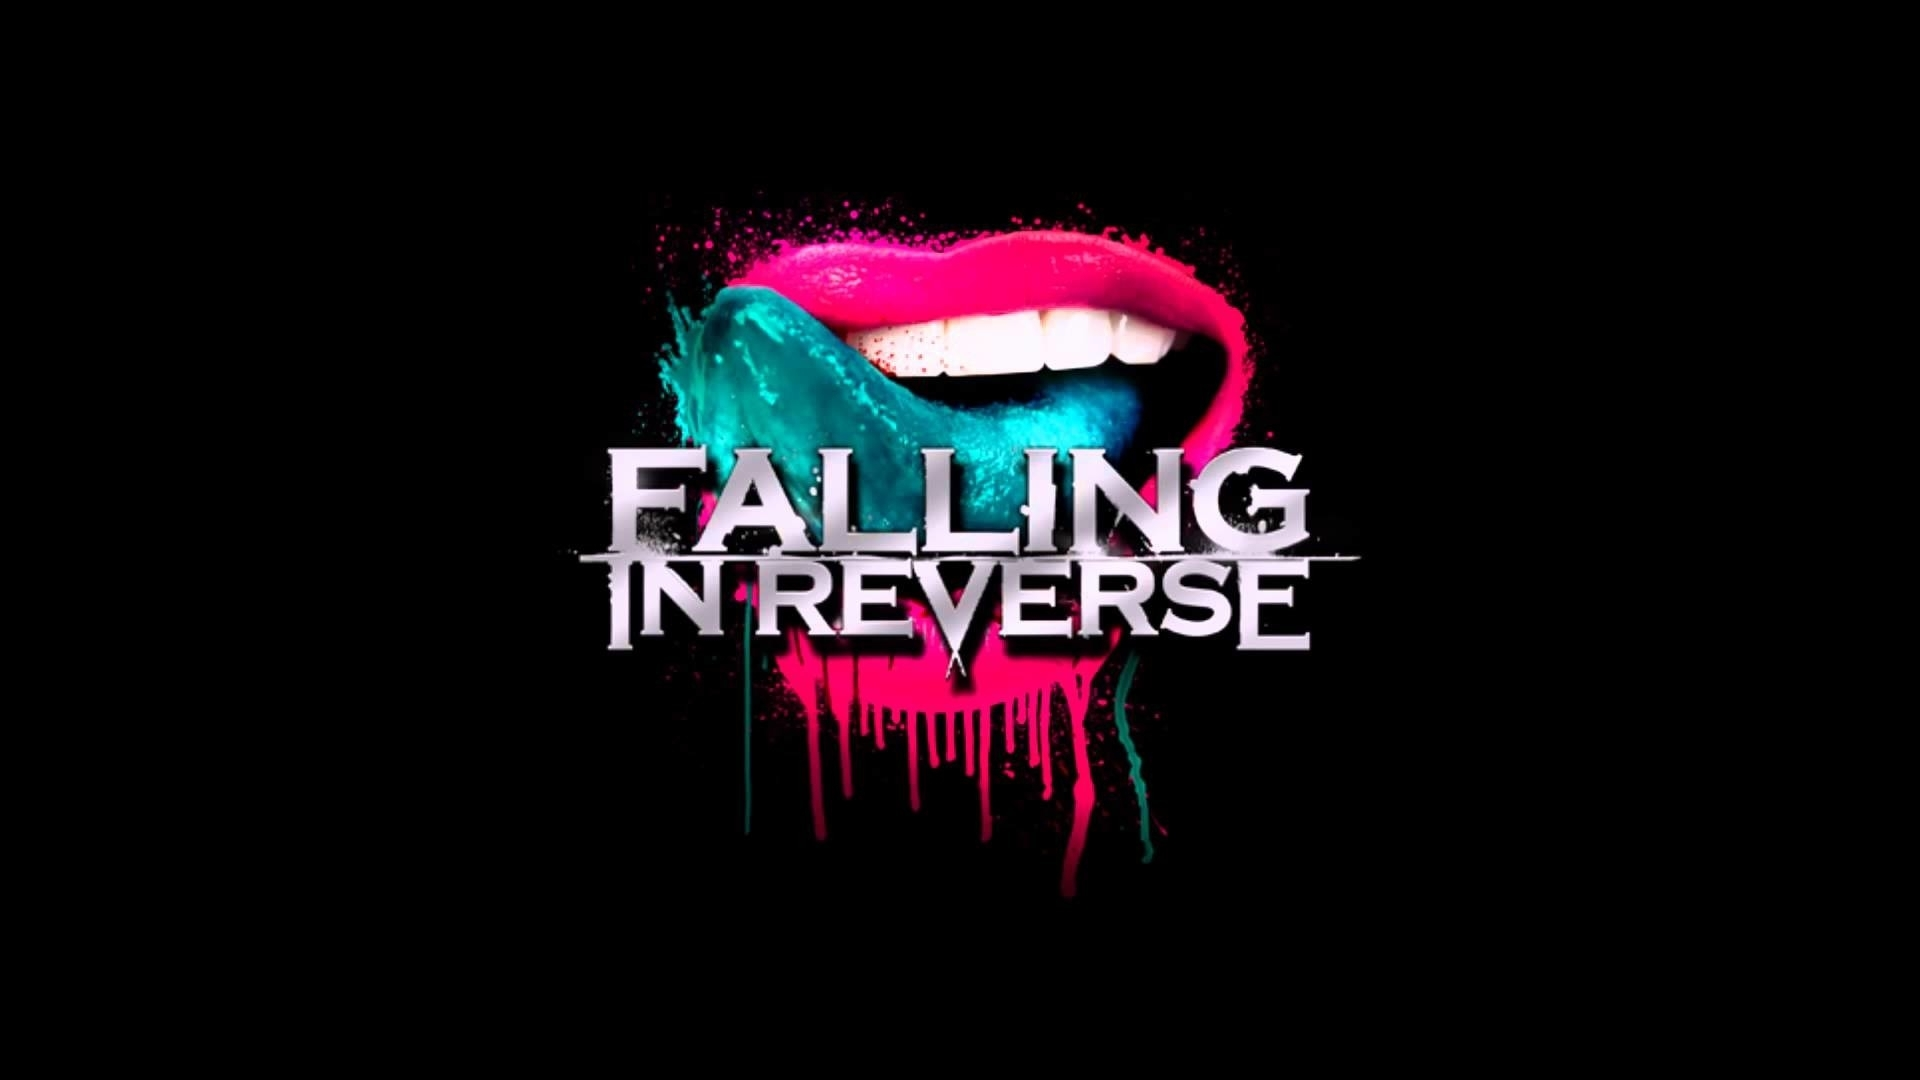 falling in reverse wallpapers ·①